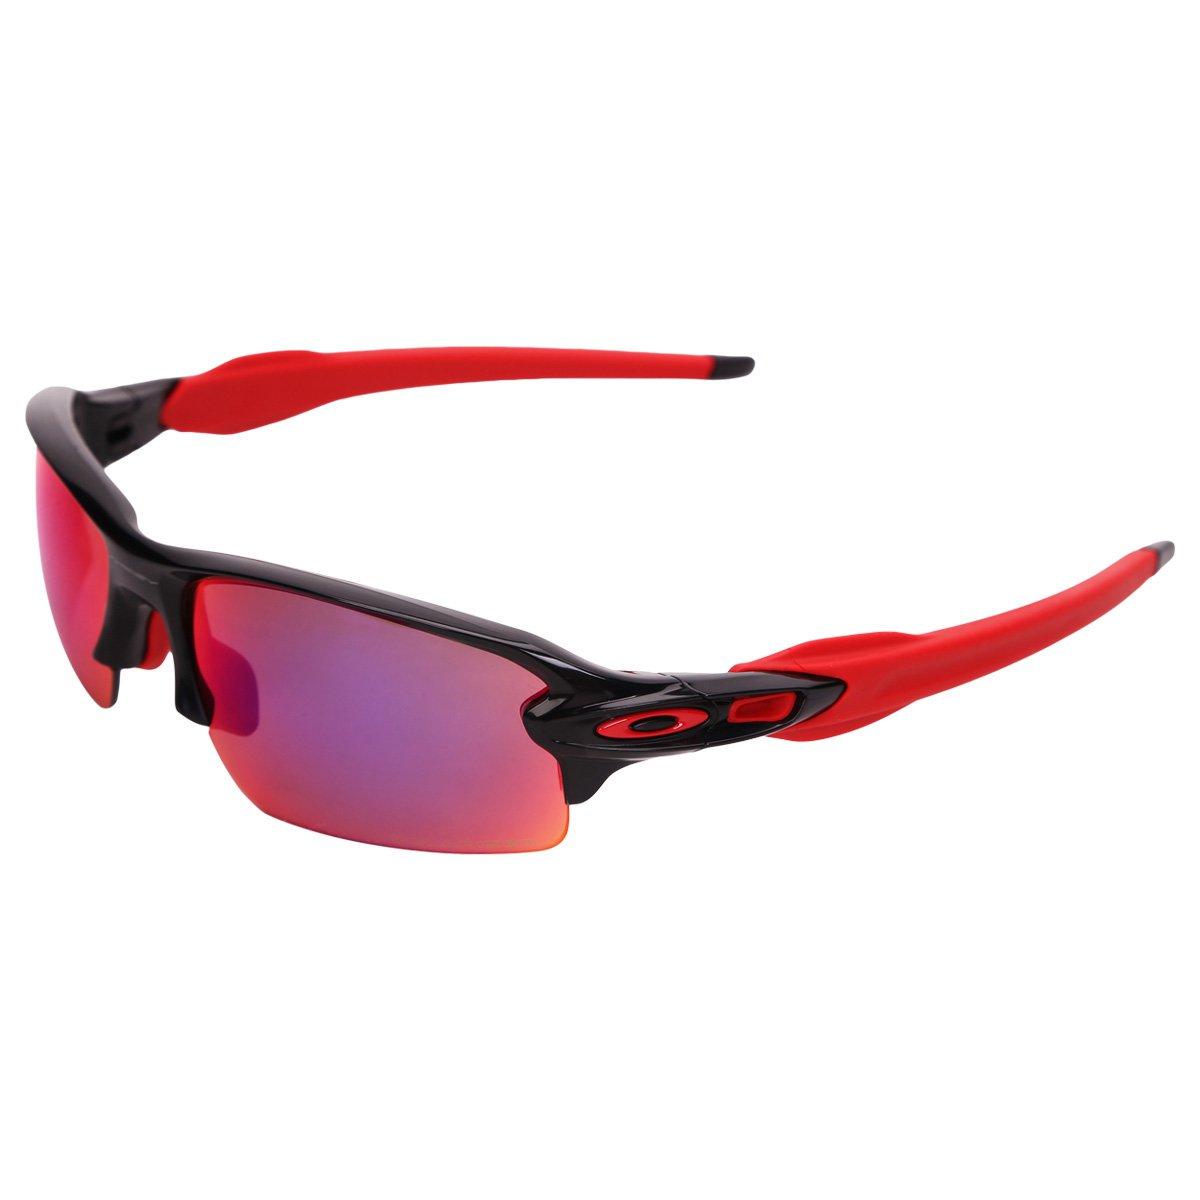 b0abbdbce Óculos Oakley Flak 2.0 - Polarizada   Netshoes